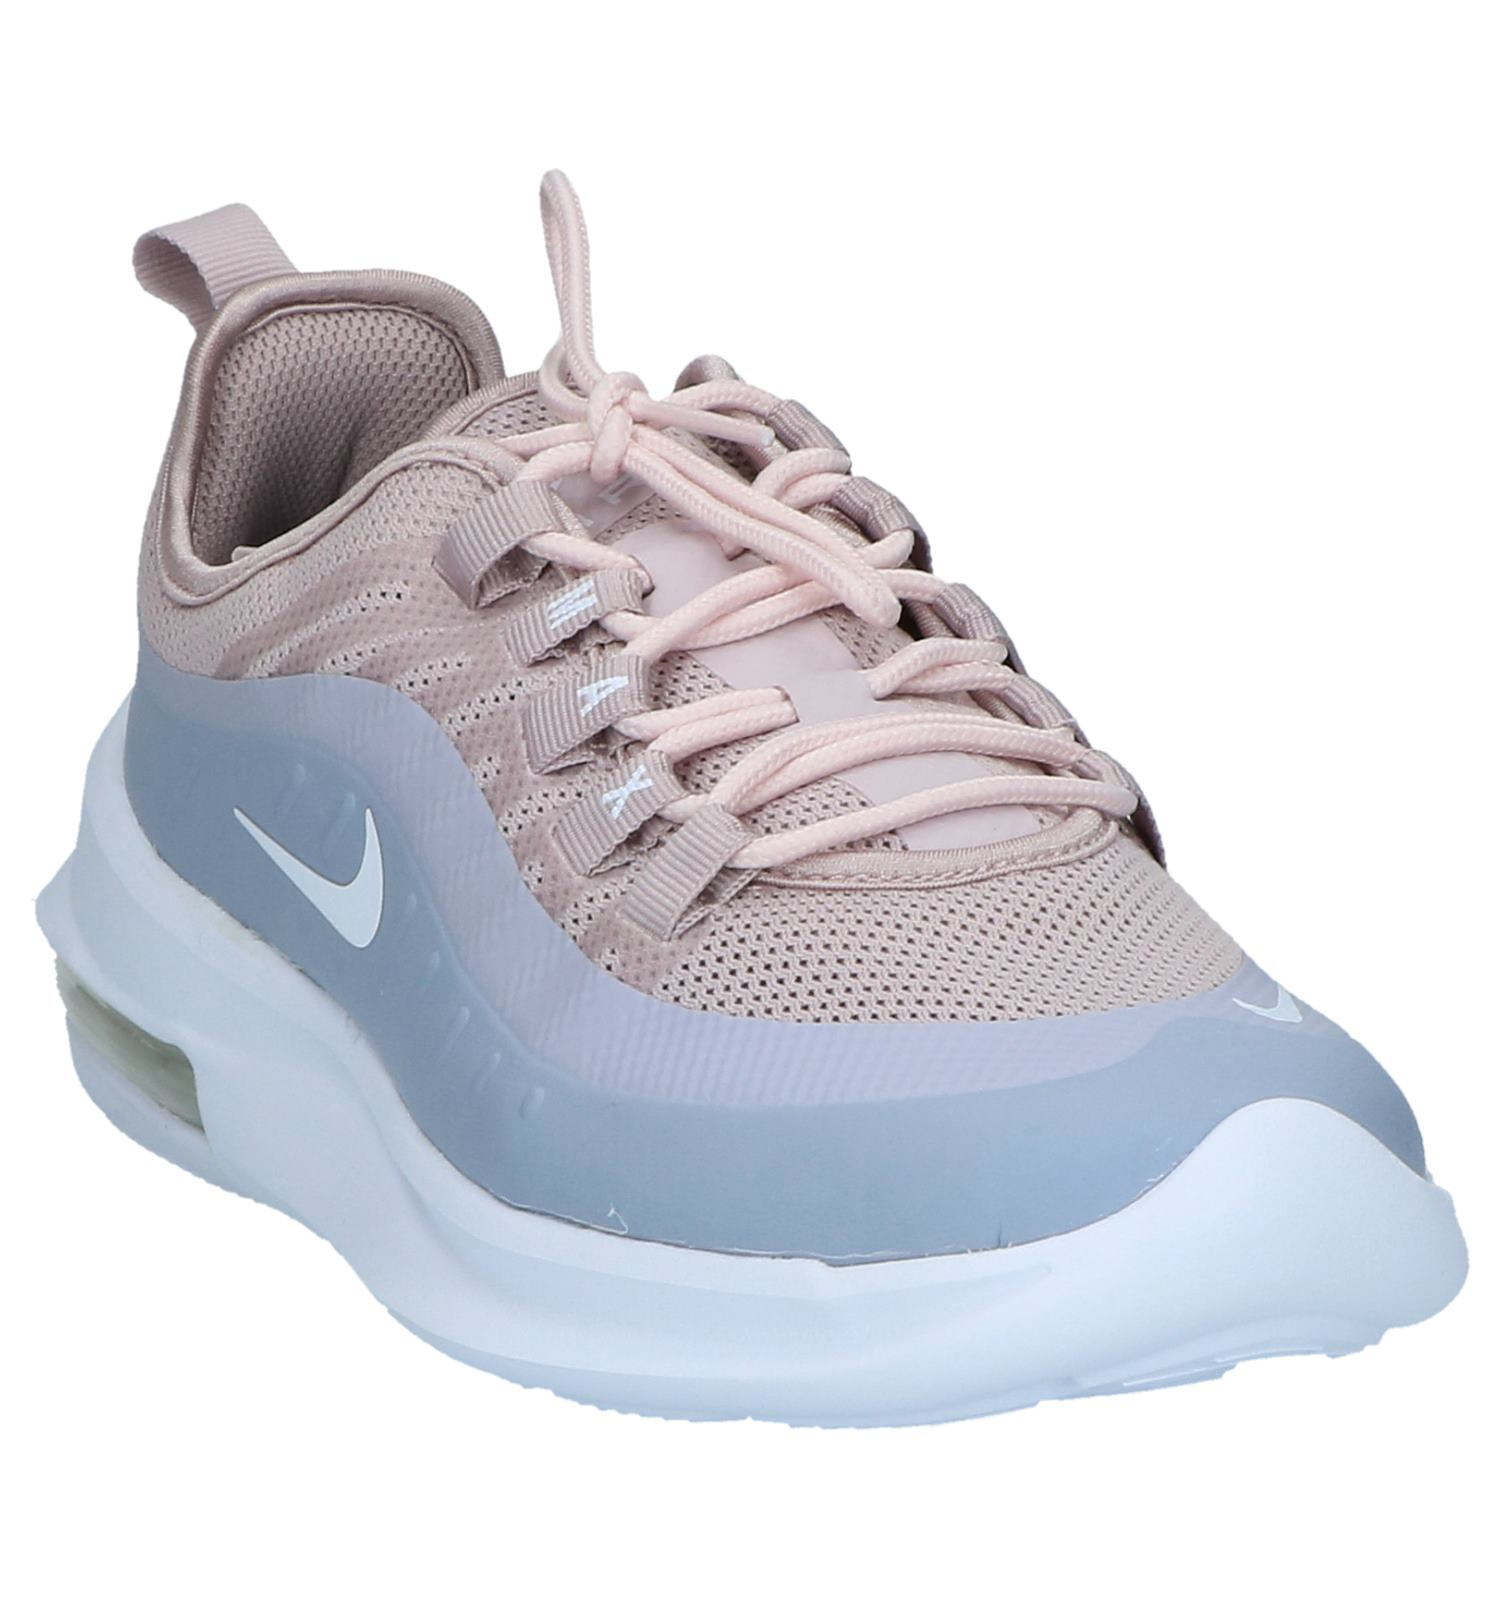 Roze Runner Sneakers Nike Air Max Axis | TORFS.BE | Gratis ...